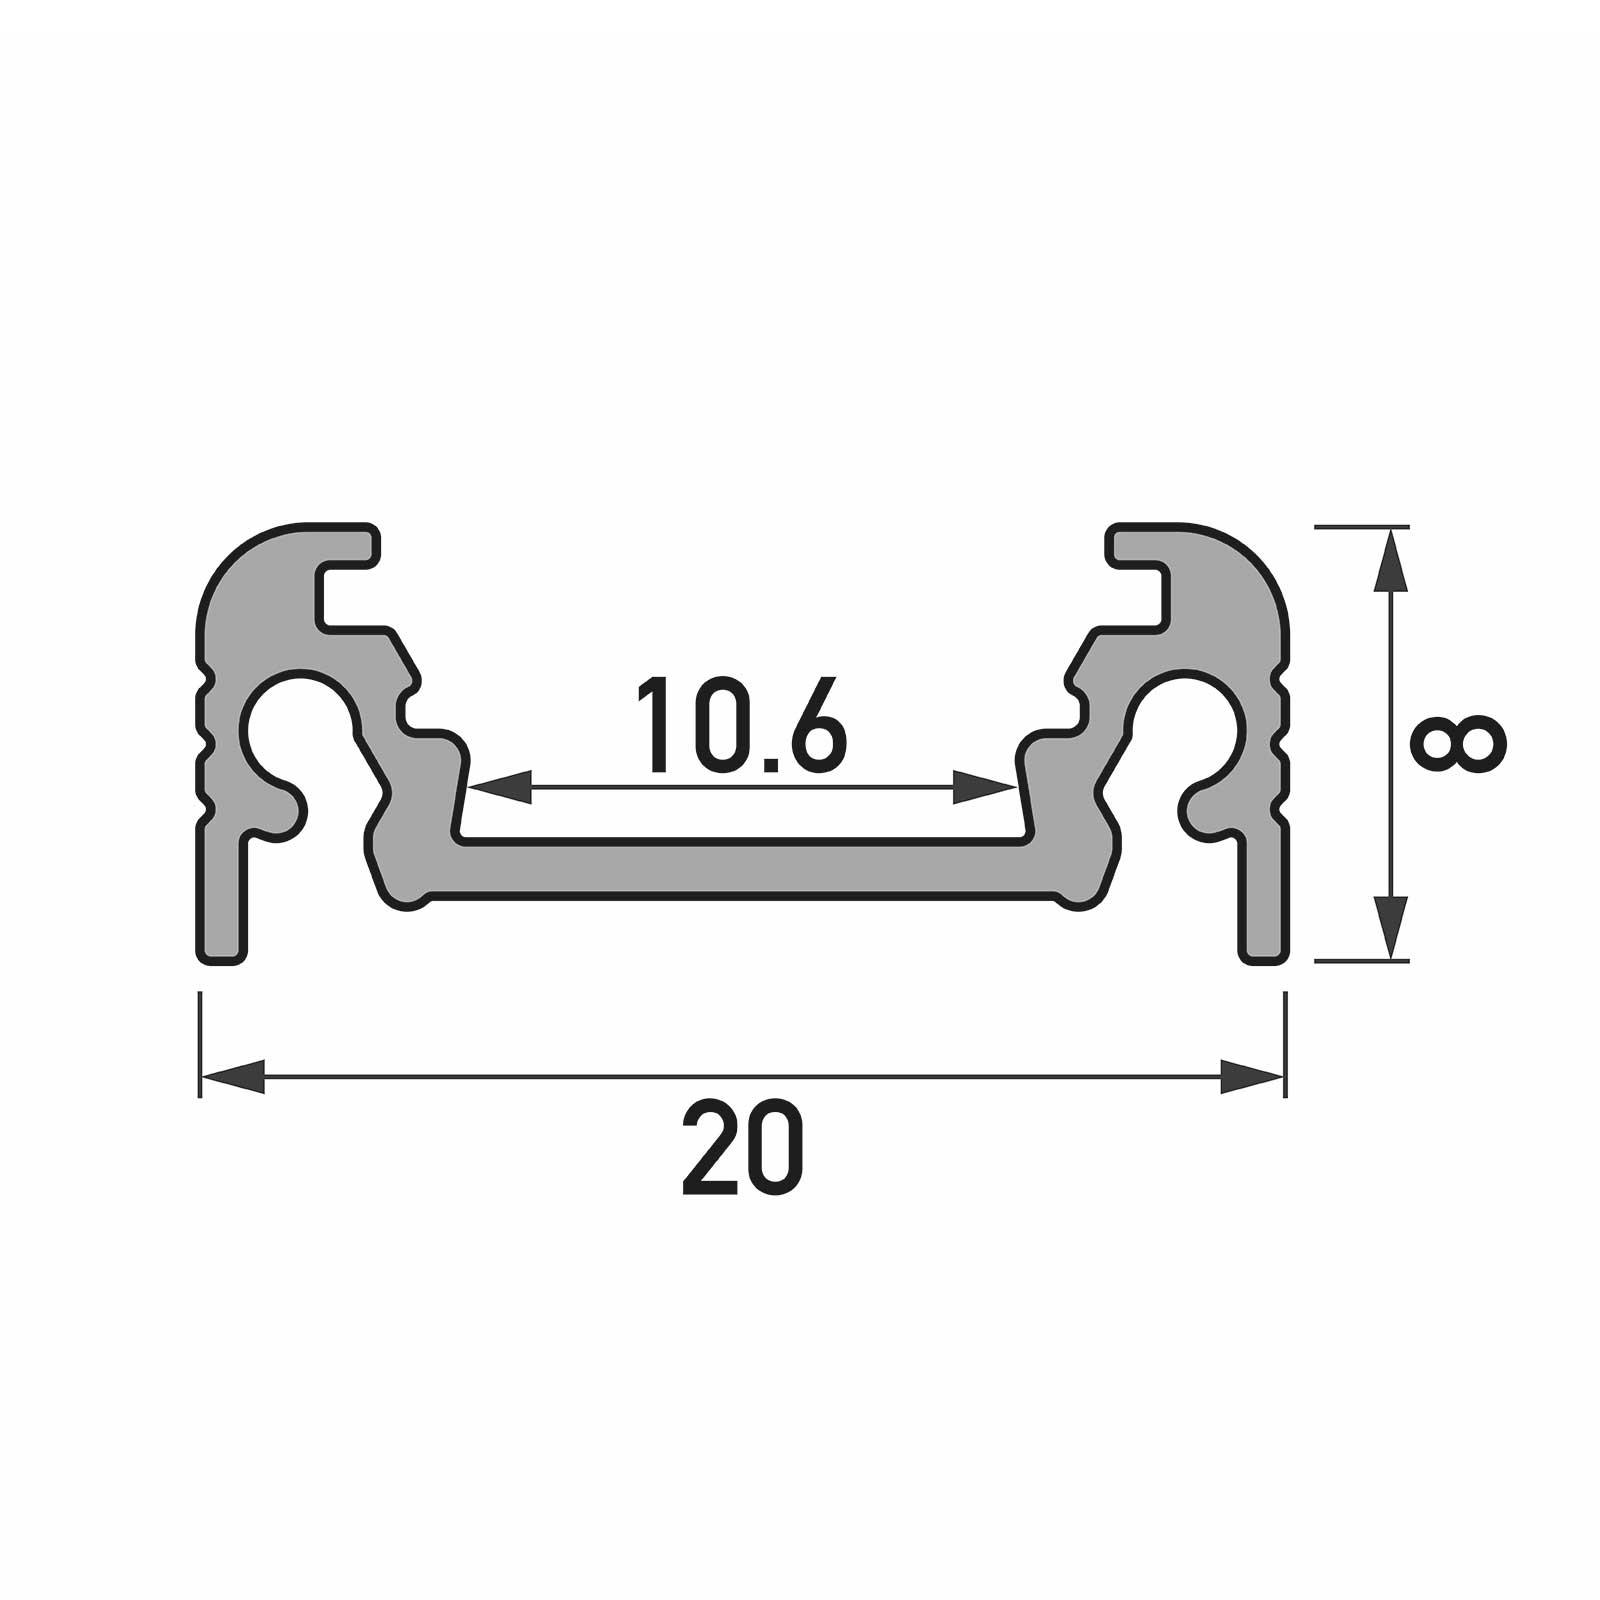 Bemassung 1-2 Meter LED Aufbauprofil SURFACE (SU) - U-Profil